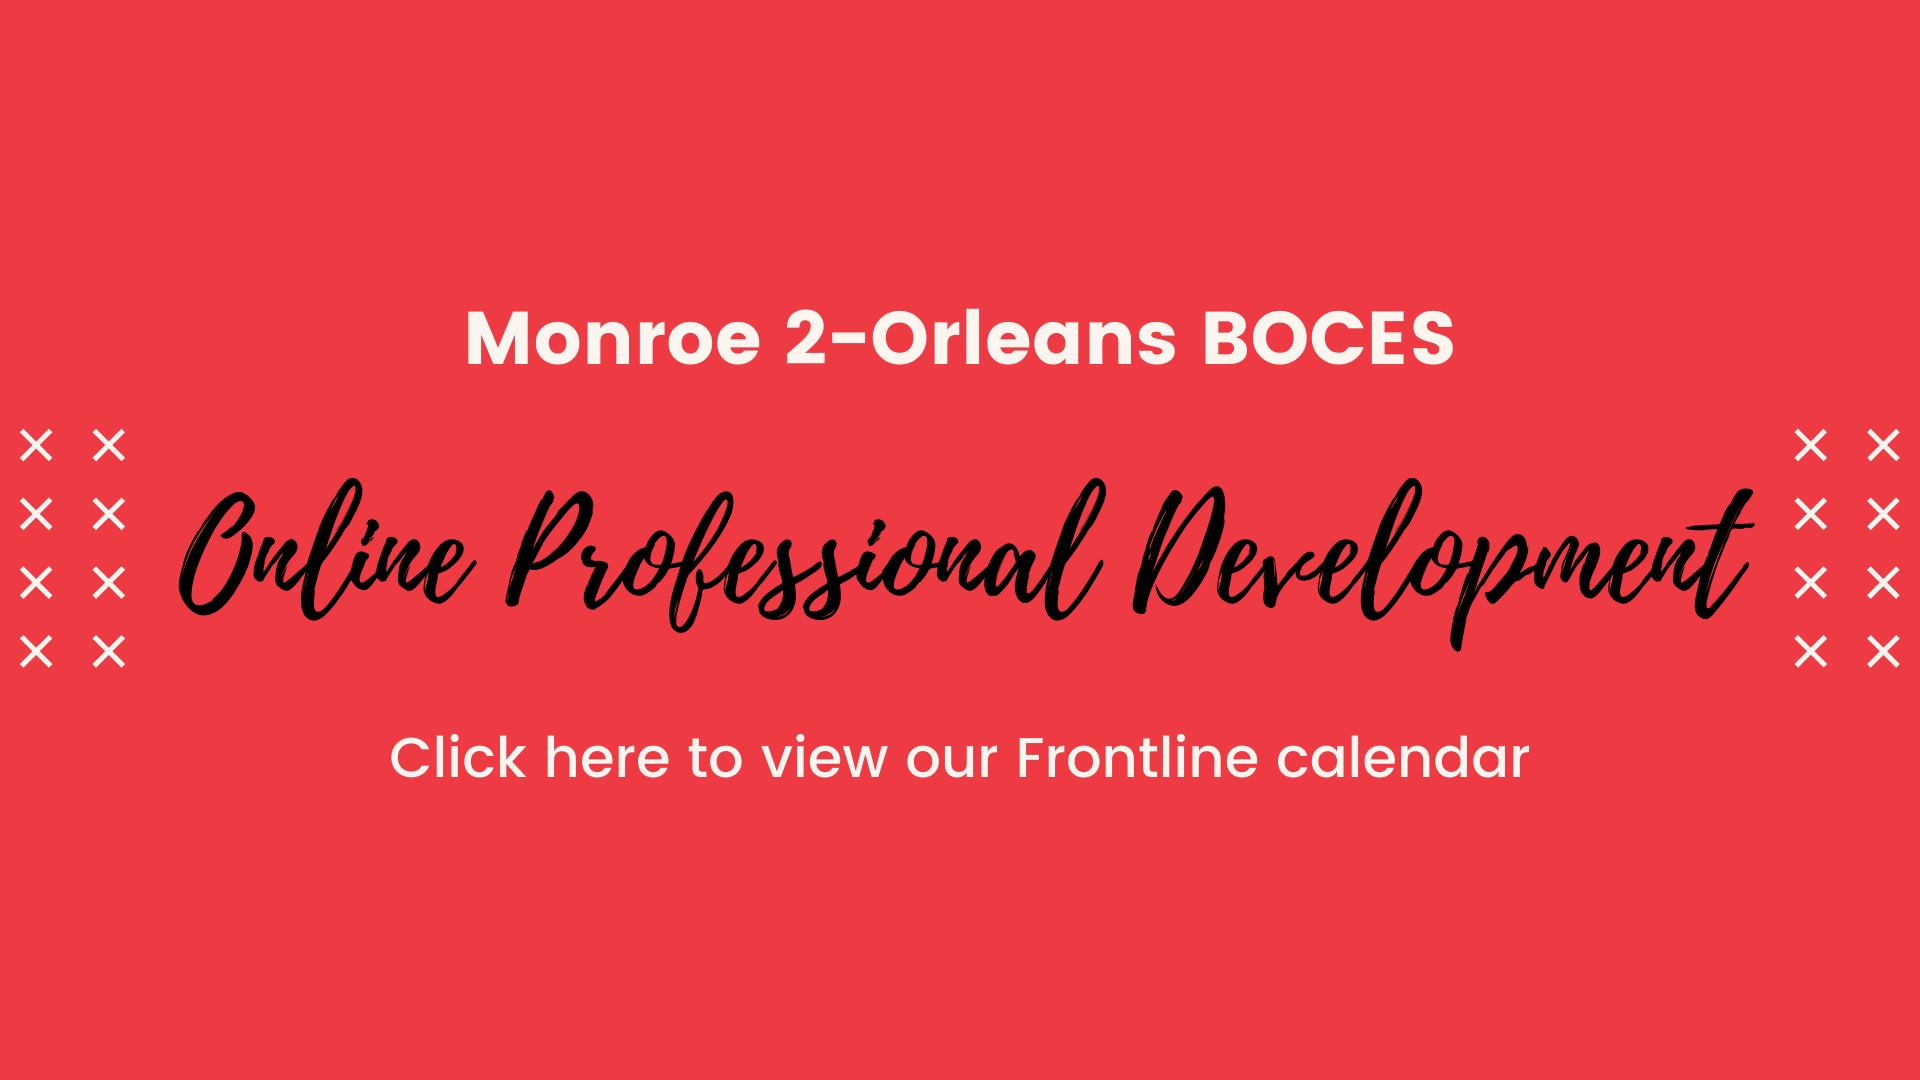 Online Professional Development link to Frontline calendar graphic